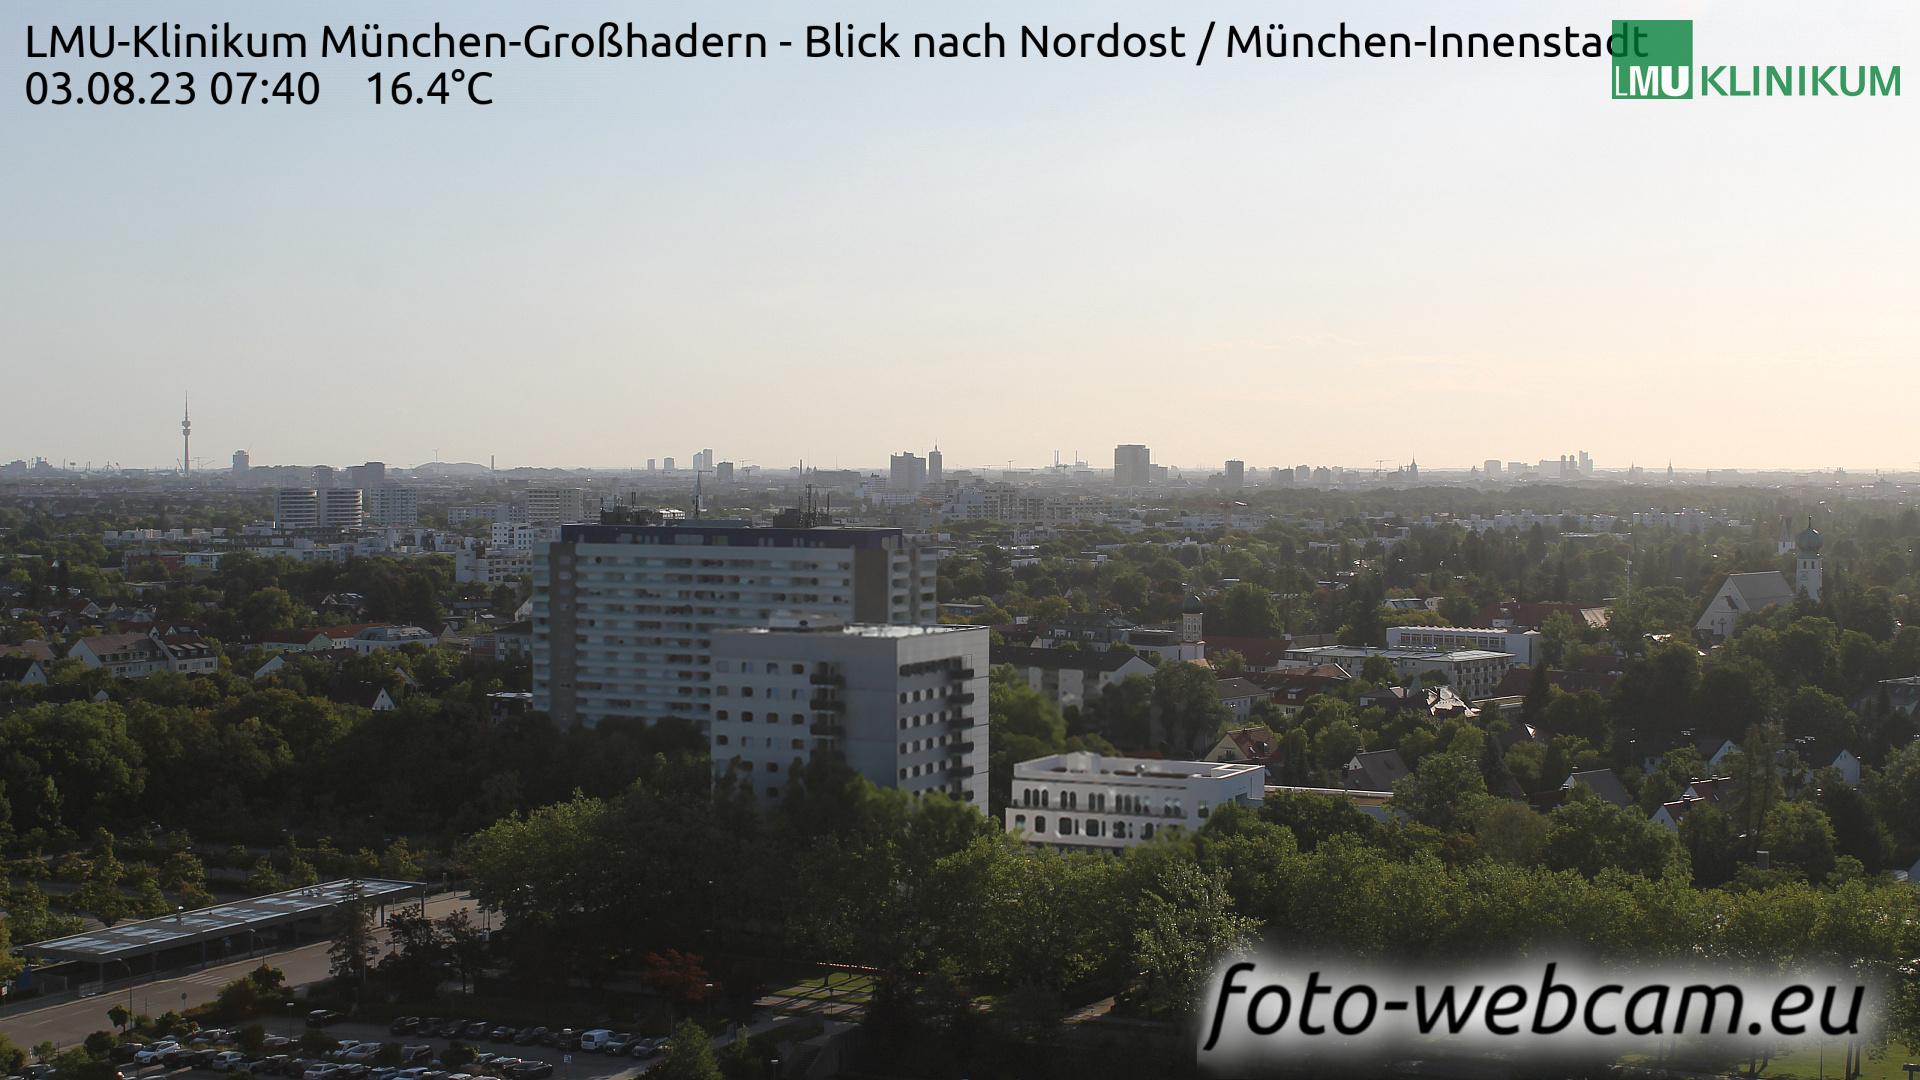 Munich Tue. 07:47